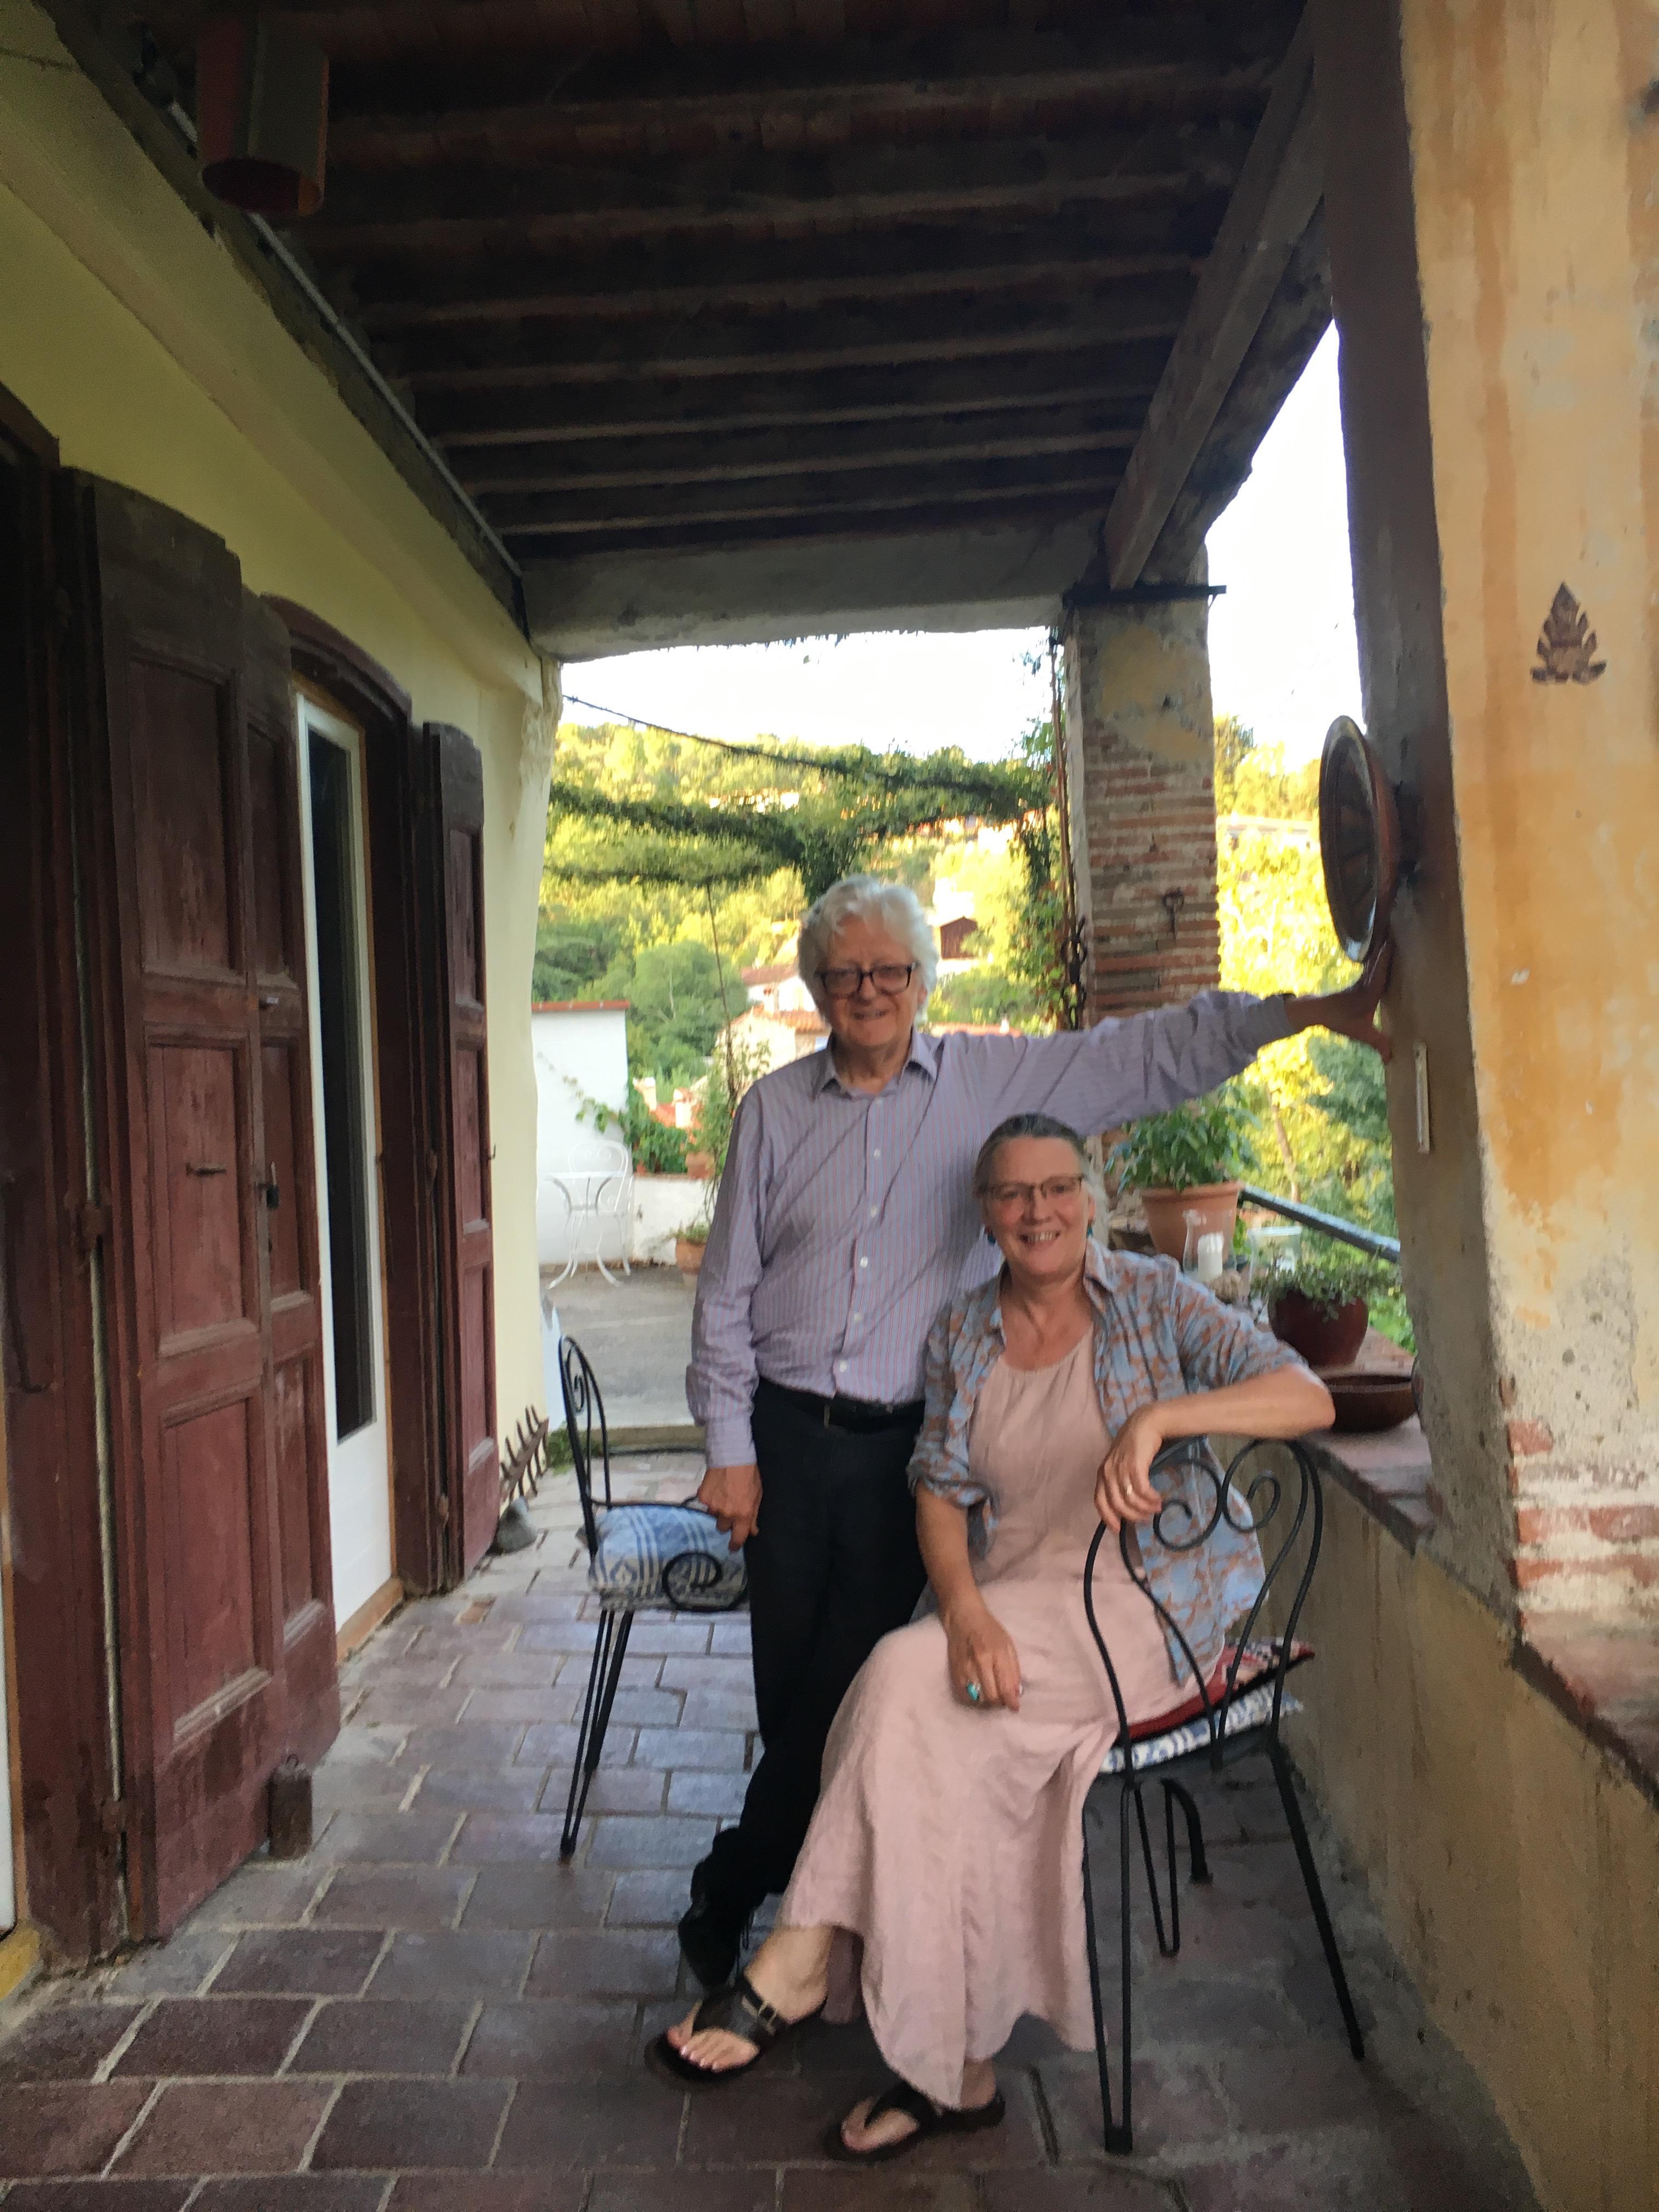 2018 - September. At home in Catllar. Pic Victor Bockris